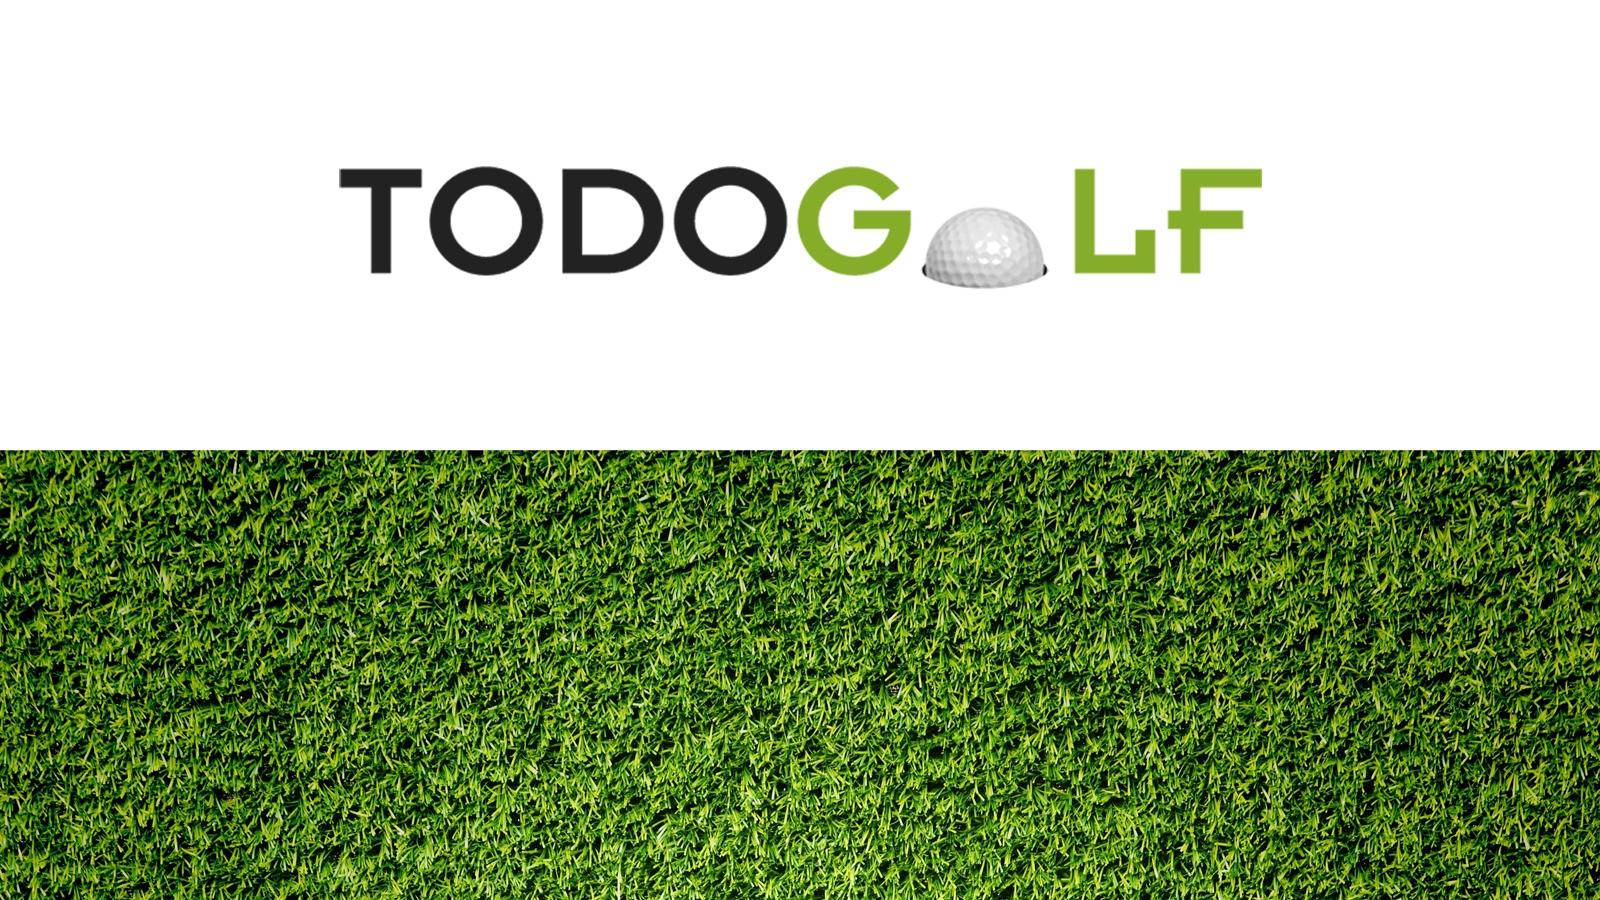 logo-Todogolf